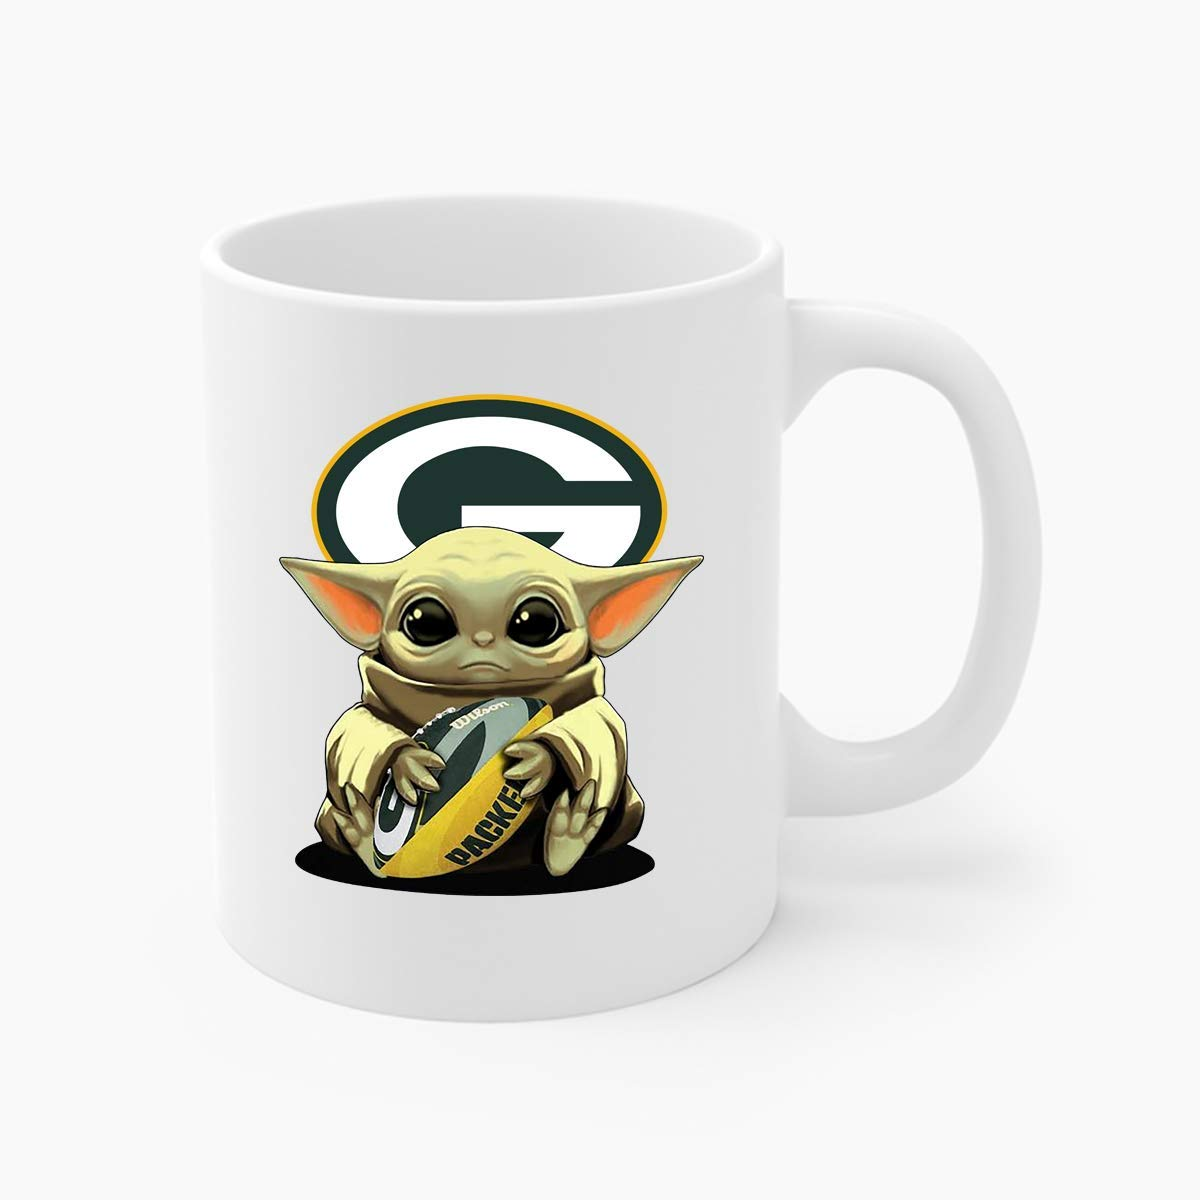 tumbler latte mug travel mug P a c k e r s Baby Yodan Mug coffee mug Baby Yodan Football Team Green Bay mug water bottle